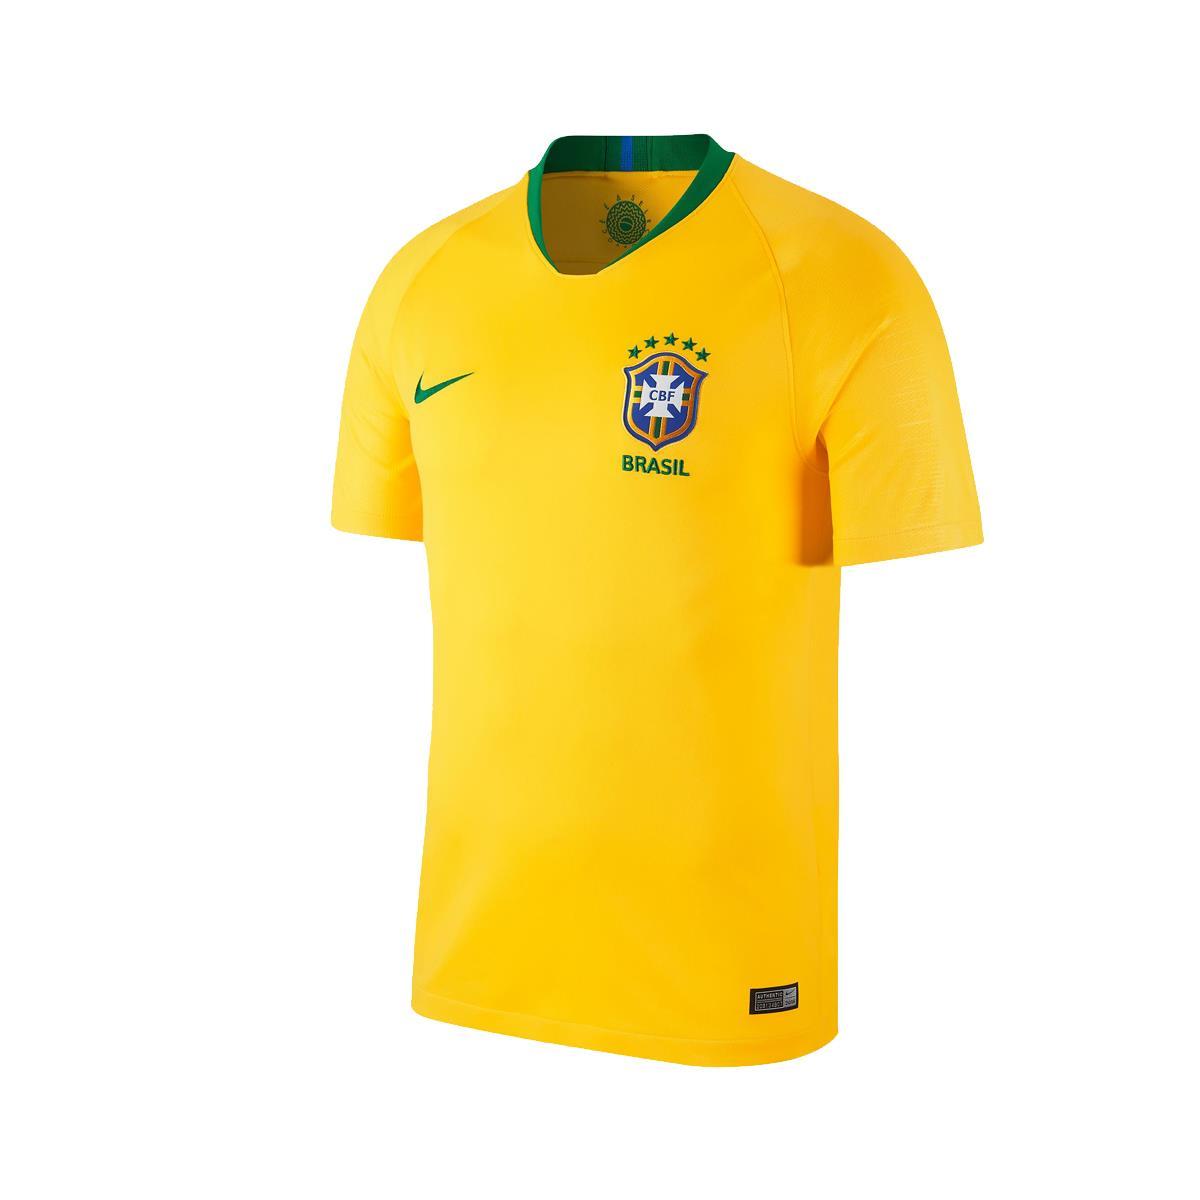 e3d4f8b919287 Camisa Nike Brasil 2018 19 Torcedor Réplica Masculina